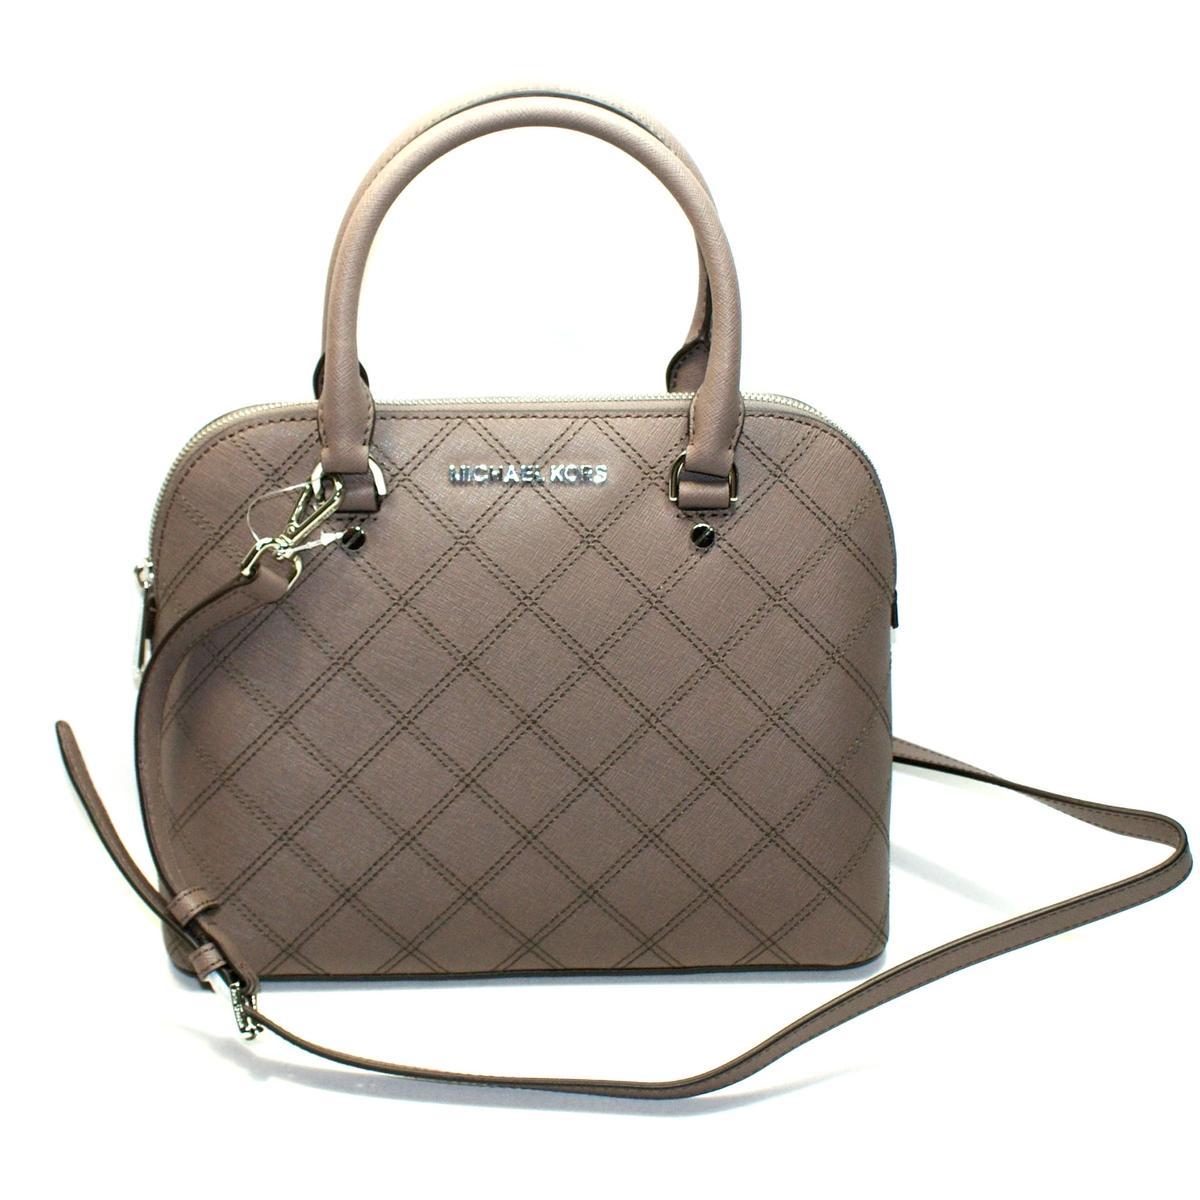 Michael Kors Cindy Medium Dome Leather Satchel\/ Crossbody Bag Cinder #30F5SCPS2T  Michael Kors